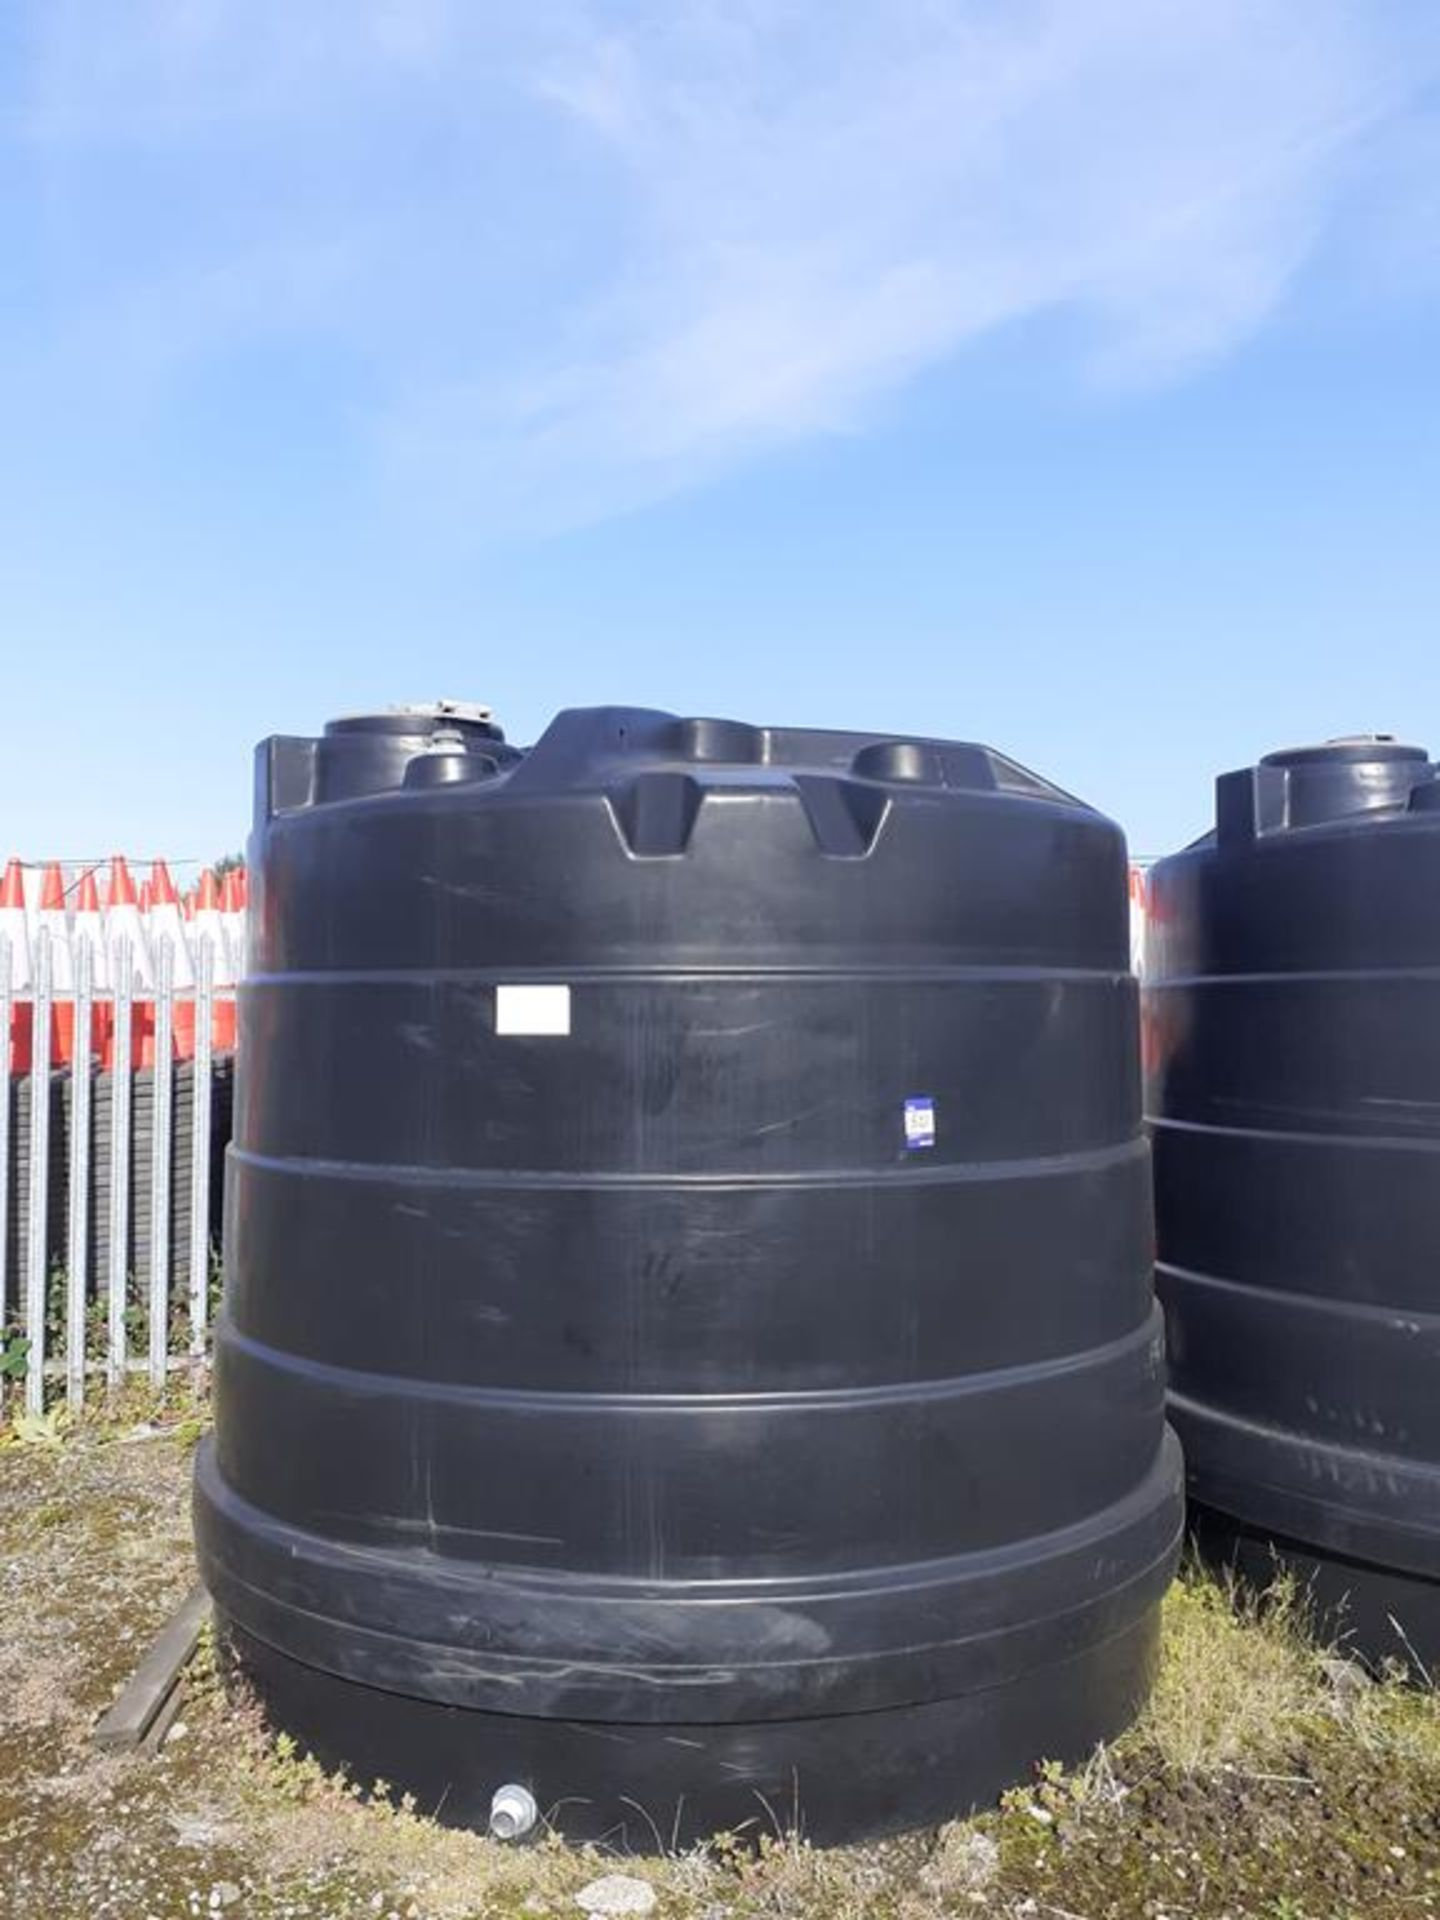 'Titan' 10,000L capacity portable water tank